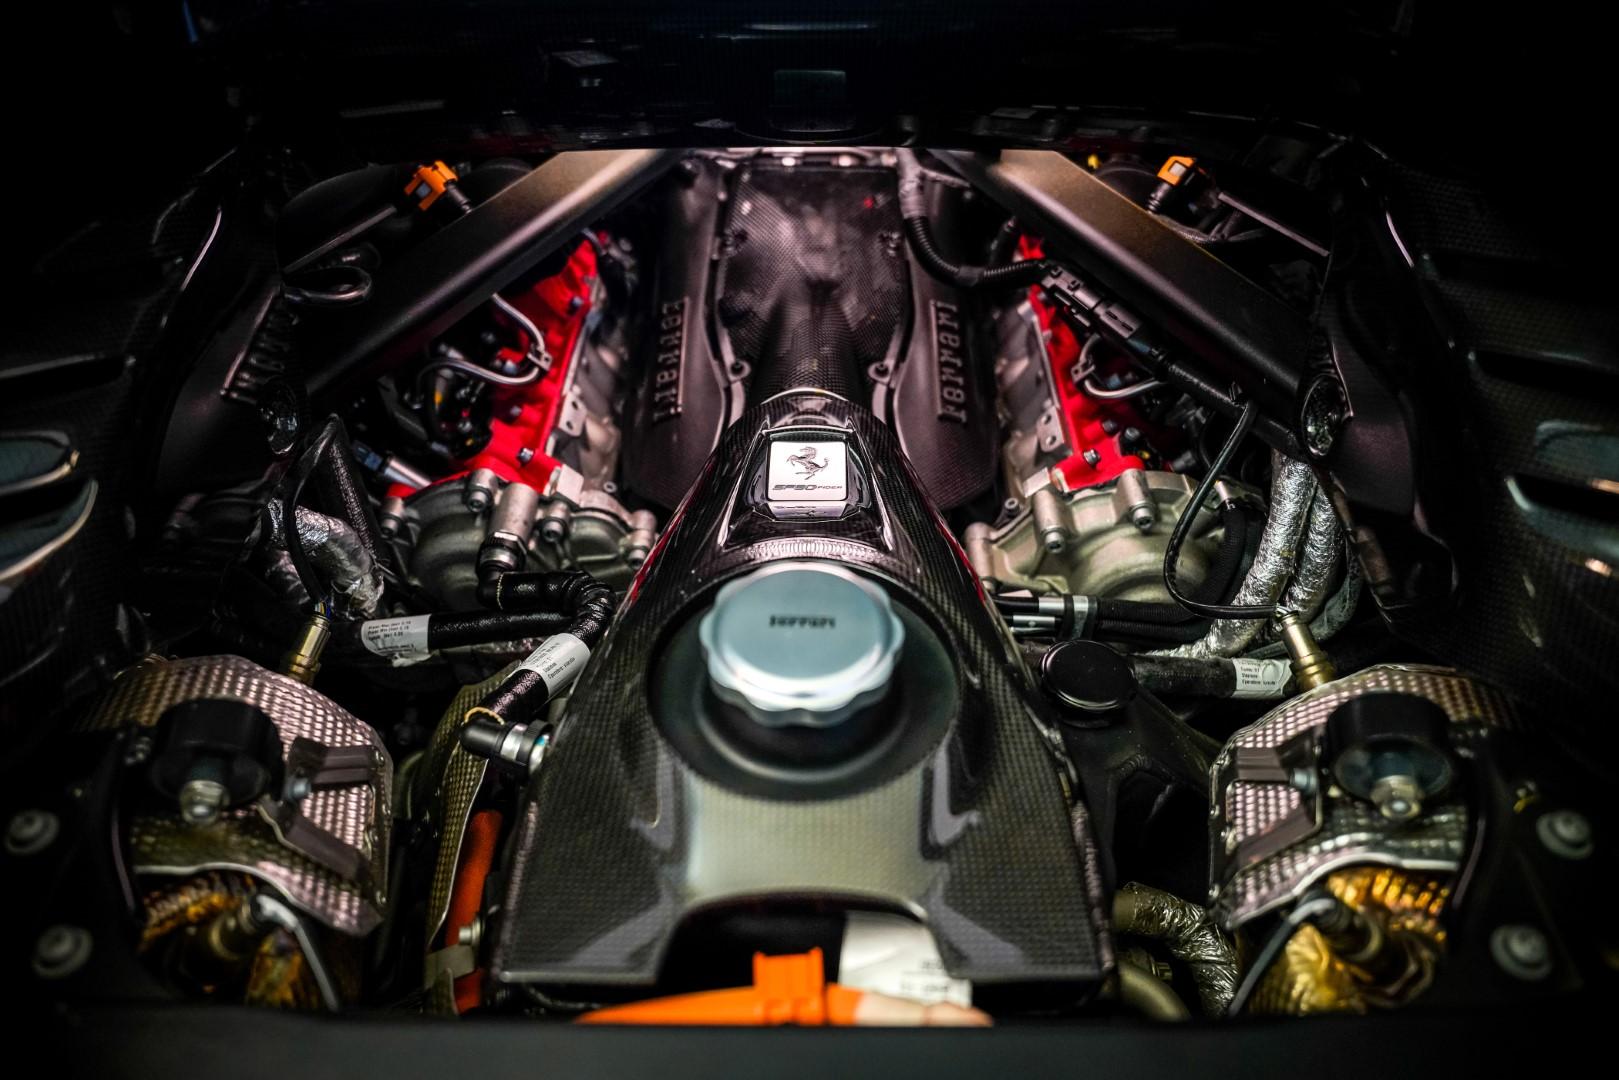 Ferrari SF90 Spider engine